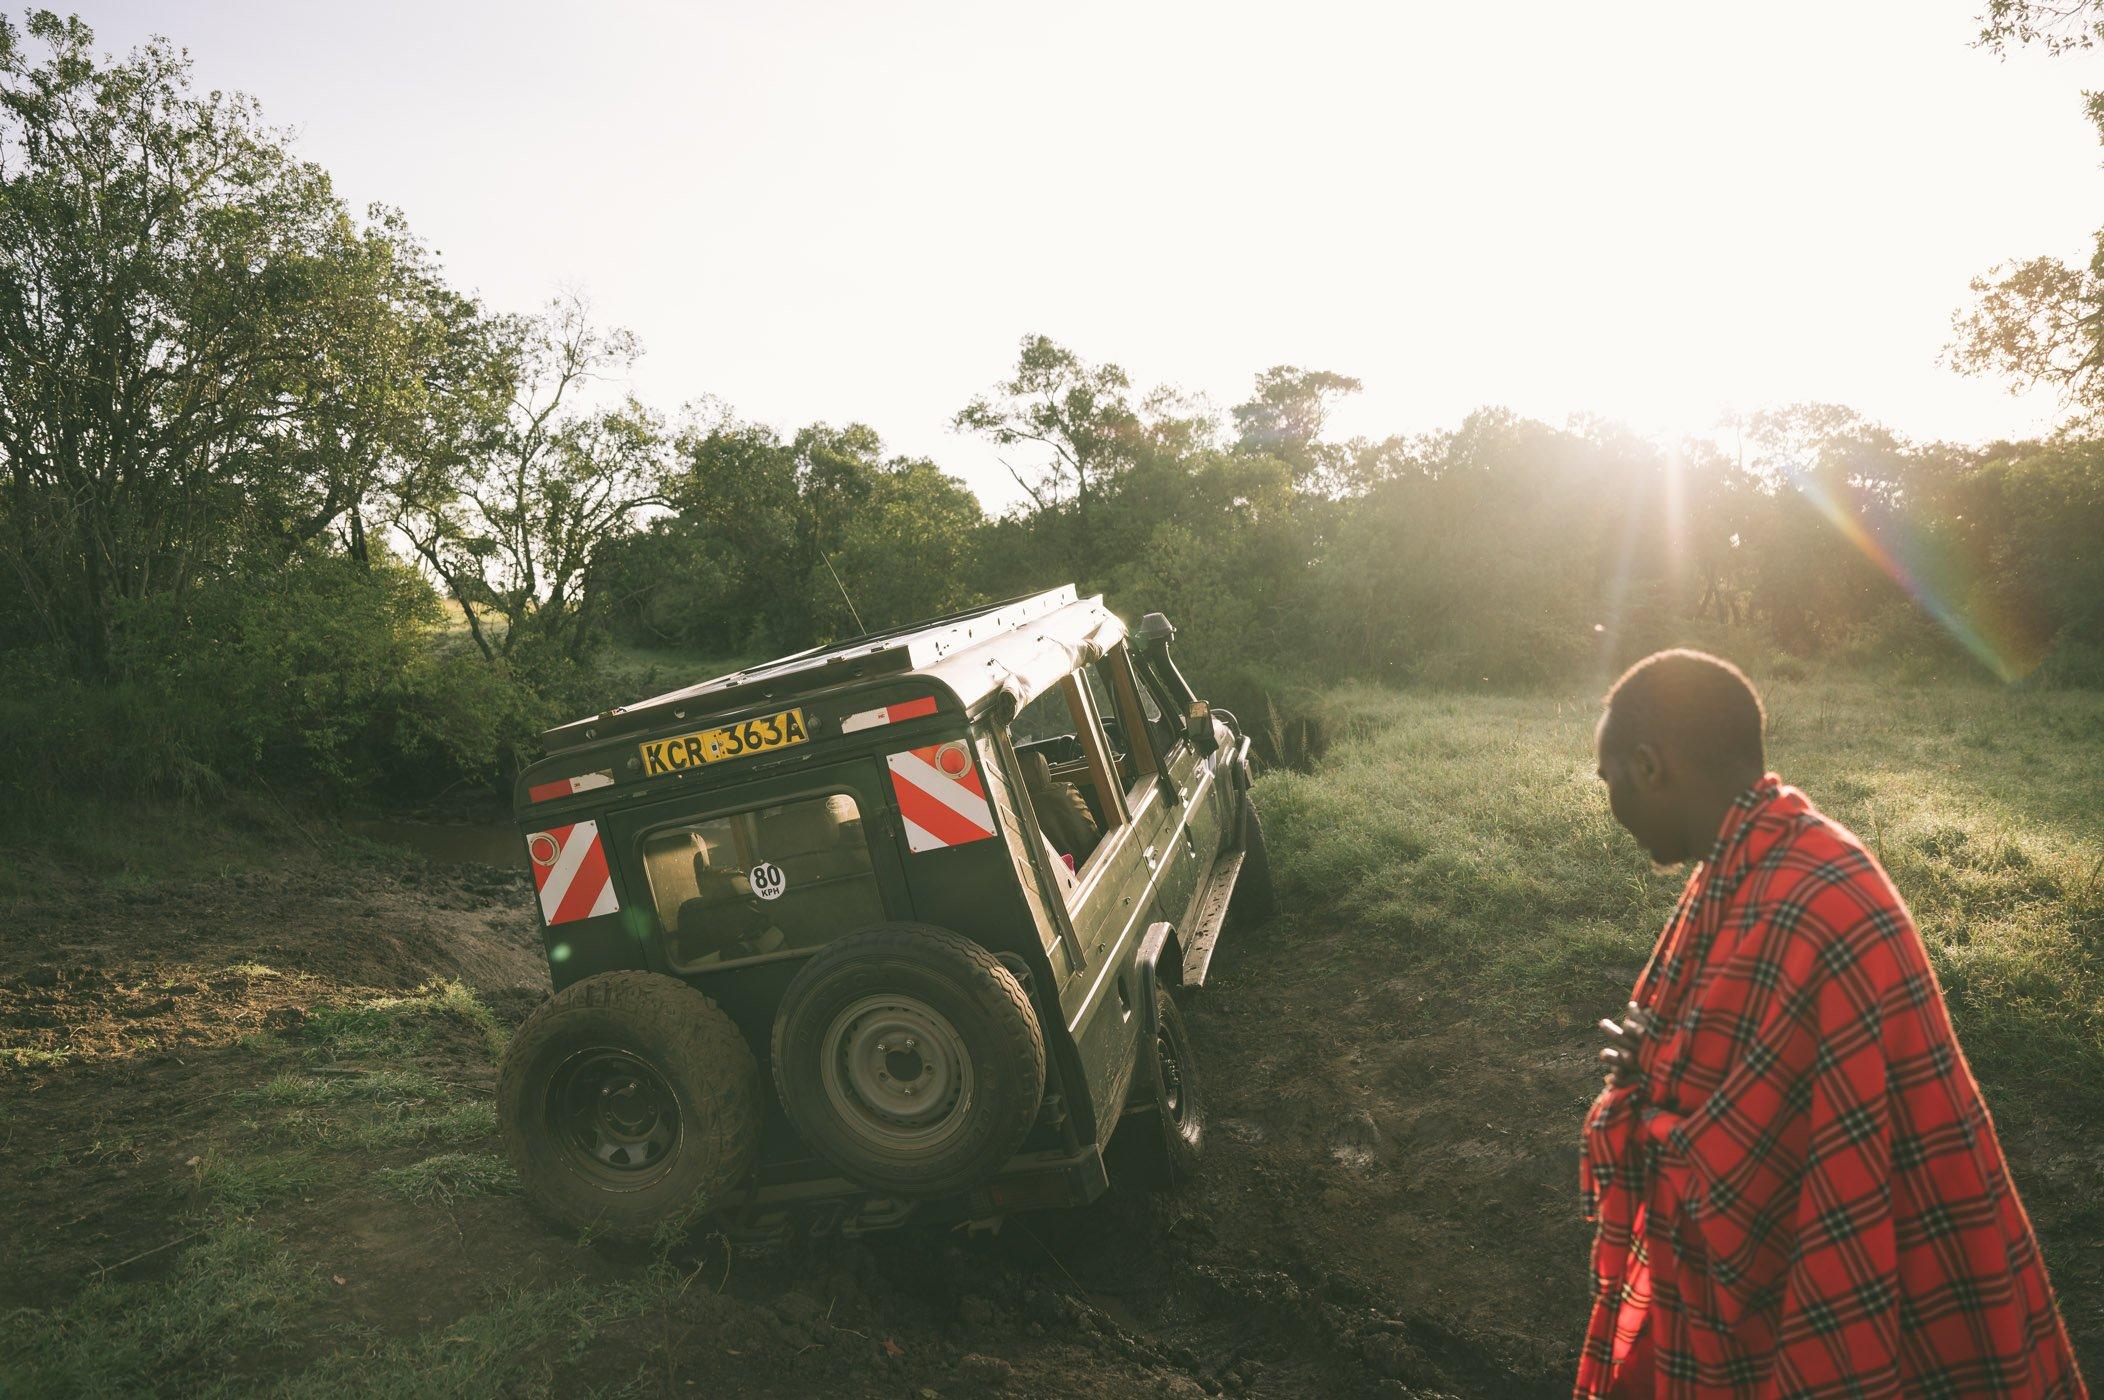 Stuck in the mud in the Maasai Mara in Kenya